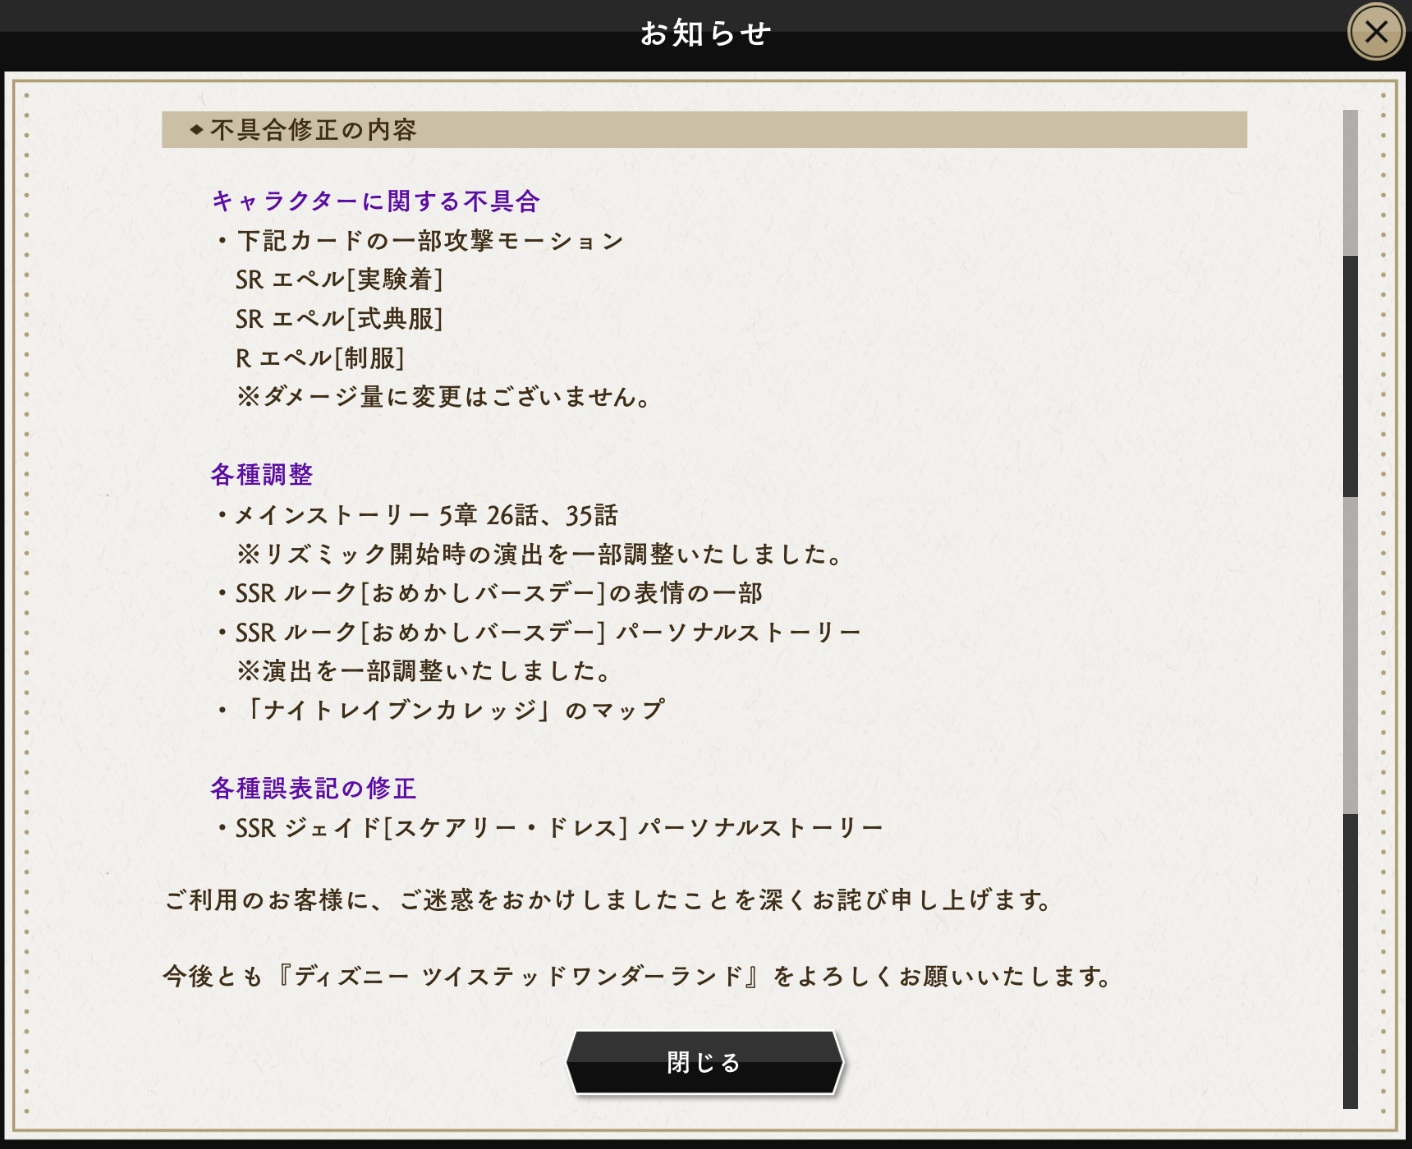 f:id:motimoti444:20201229003808p:plain